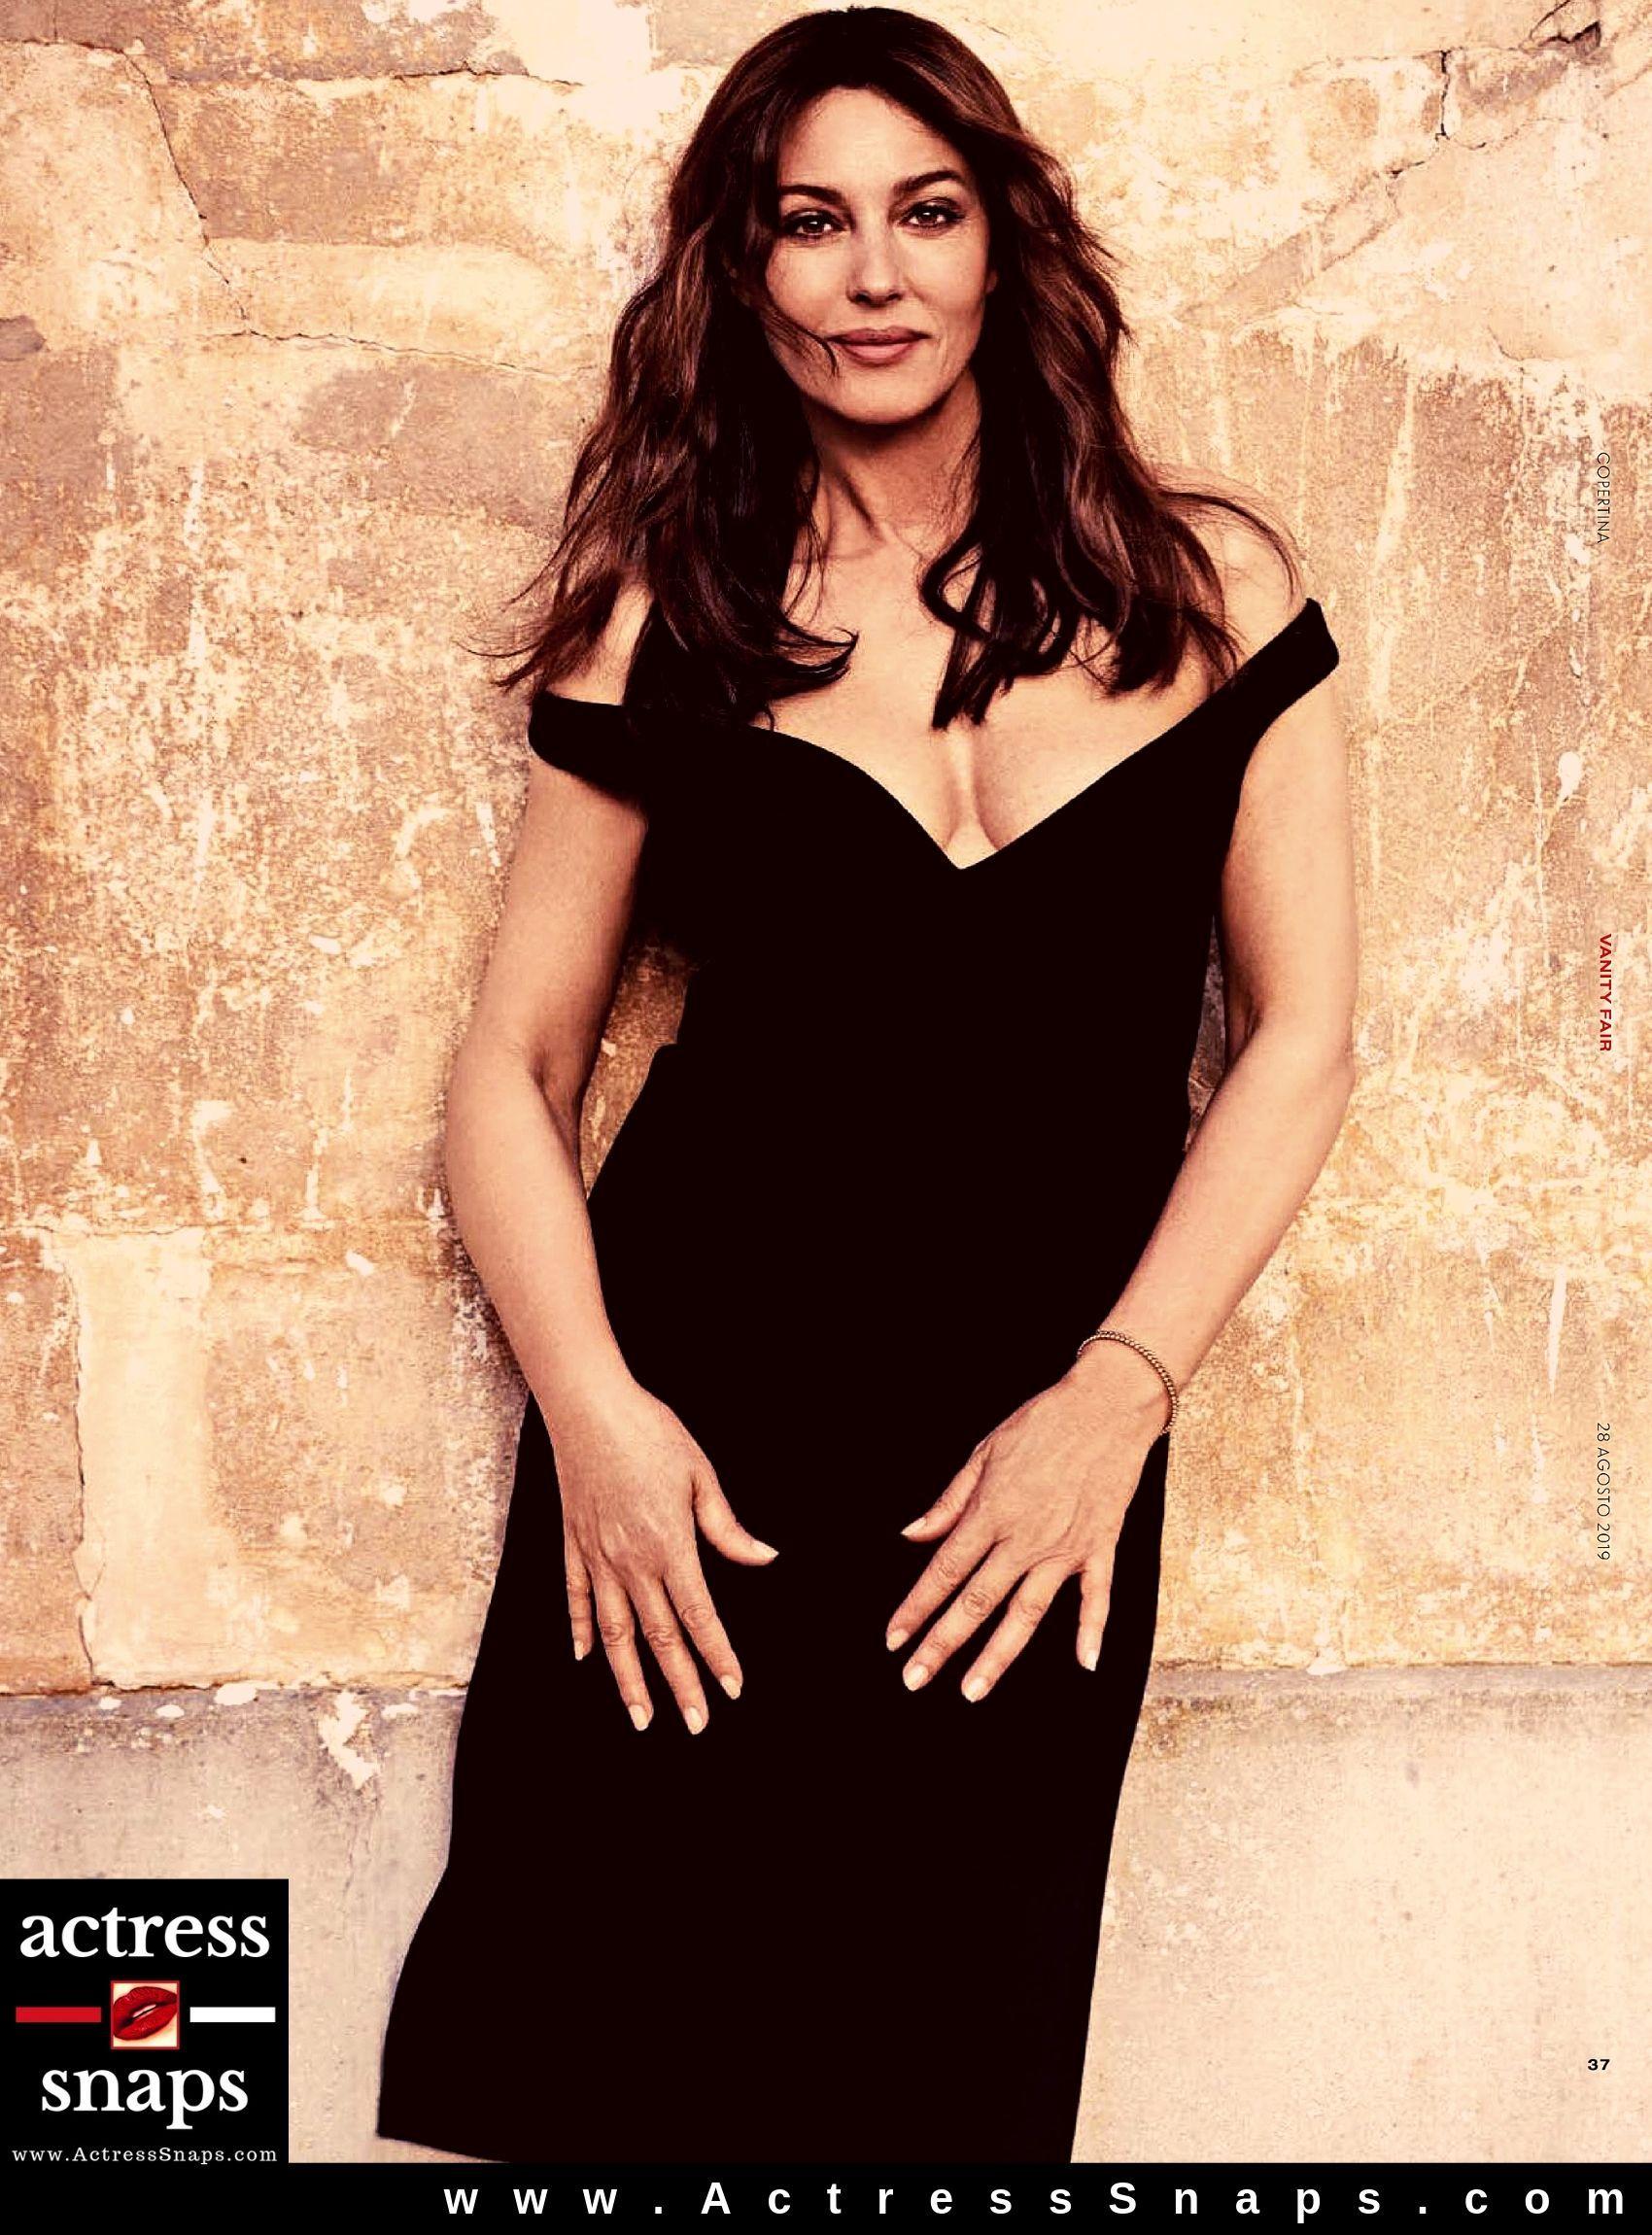 Monica Bellucci - Vanity Fair Italia Magazine - Sexy Actress Pictures | Hot Actress Pictures - ActressSnaps.com